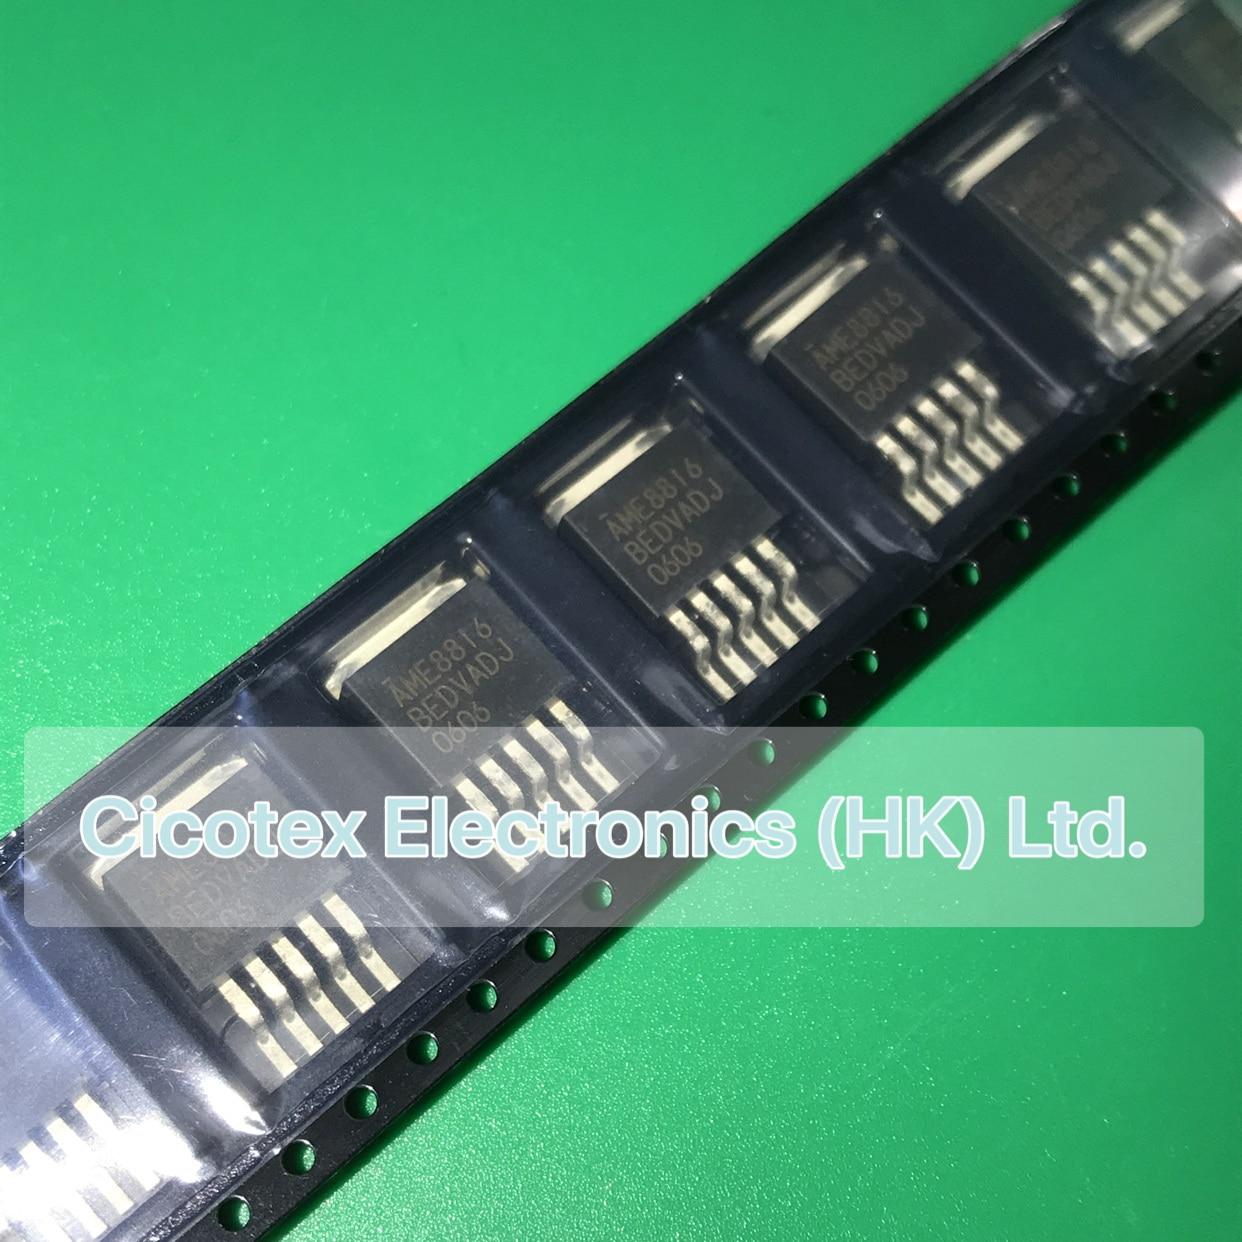 2SC3263 TO3P C3263 2SC3263Y TRANS Силовые транзисторы NPN 230 V 15A TO-3P 2SC3263-Y